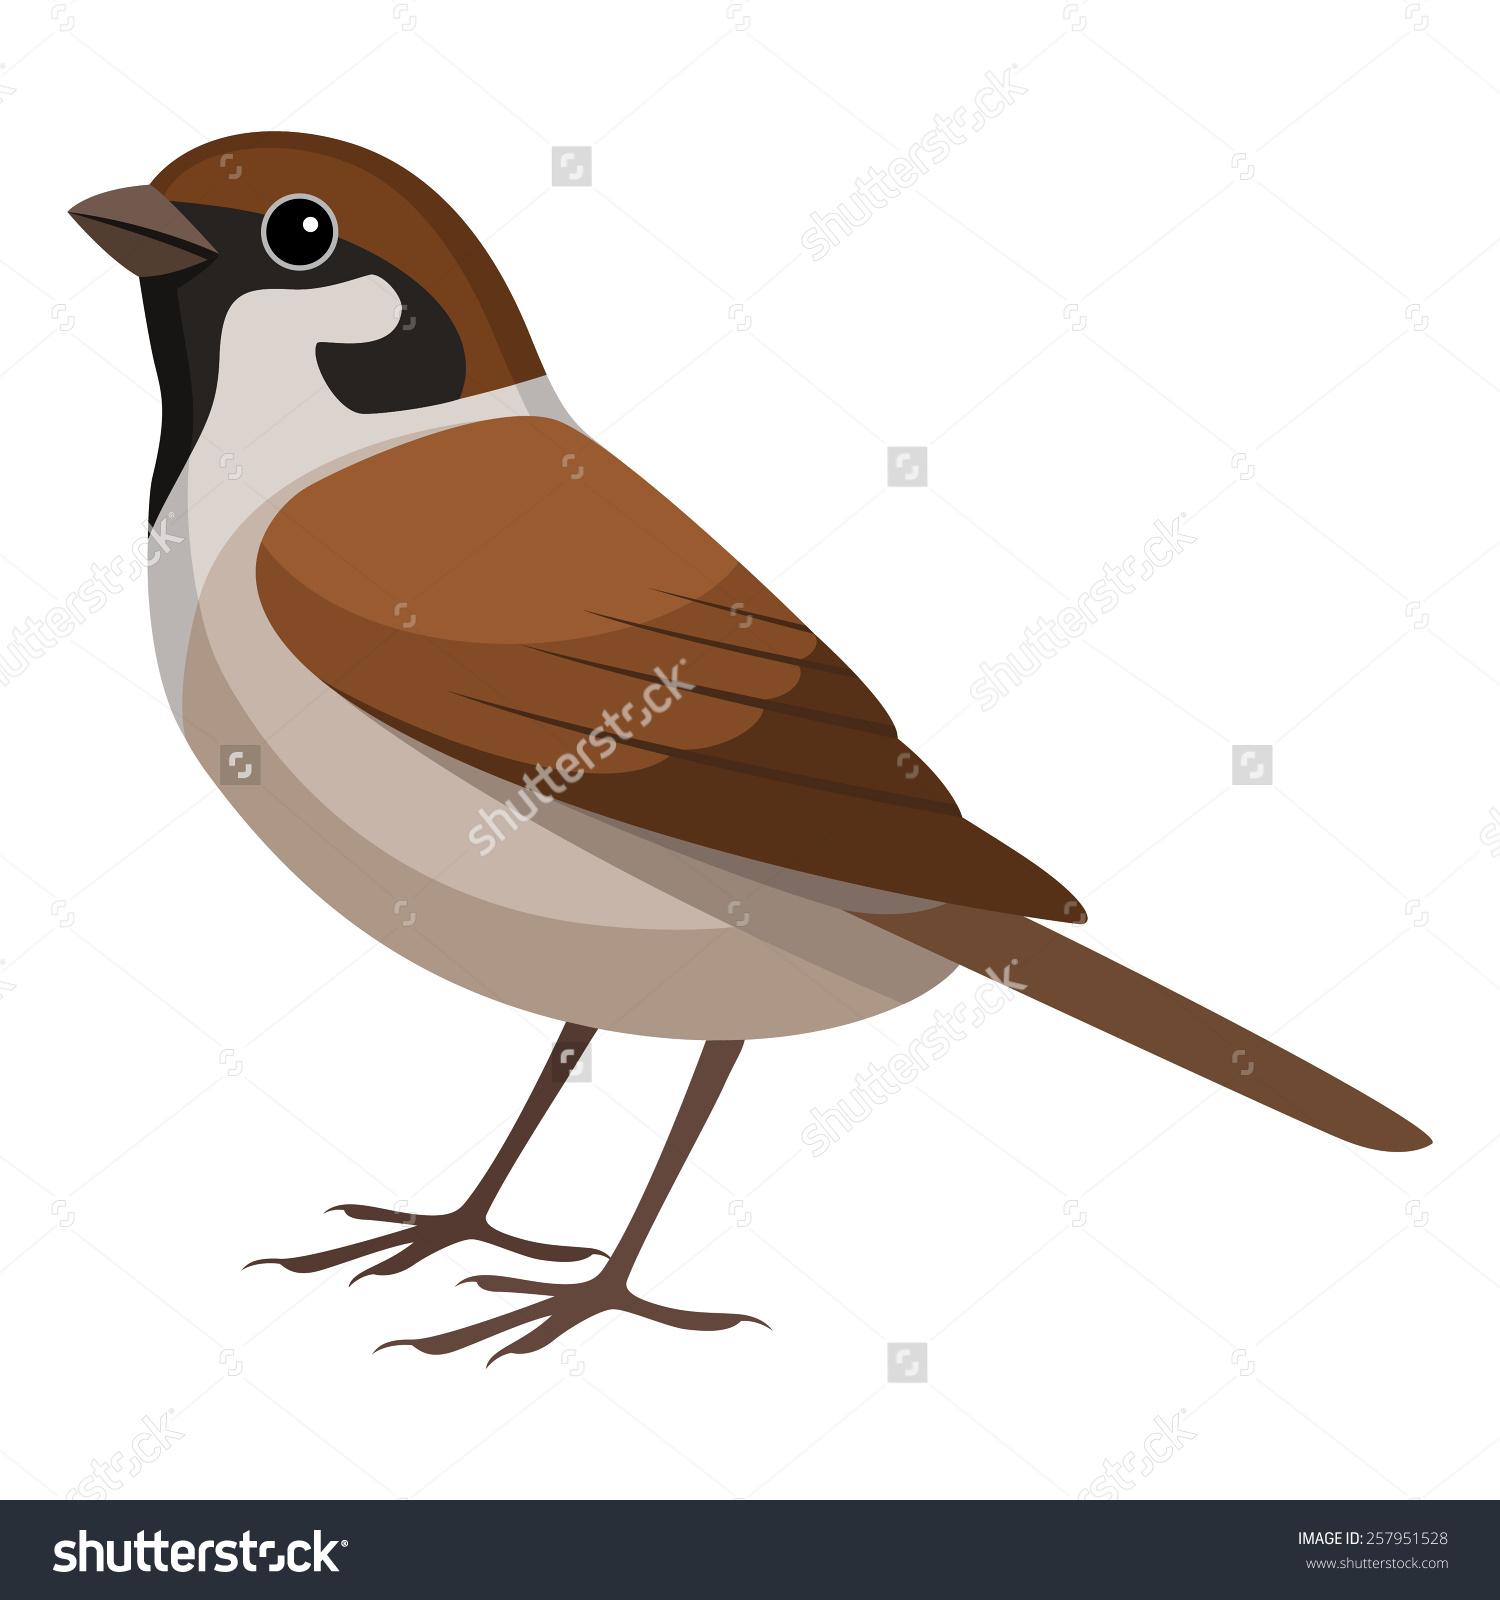 Sparrow clip art.